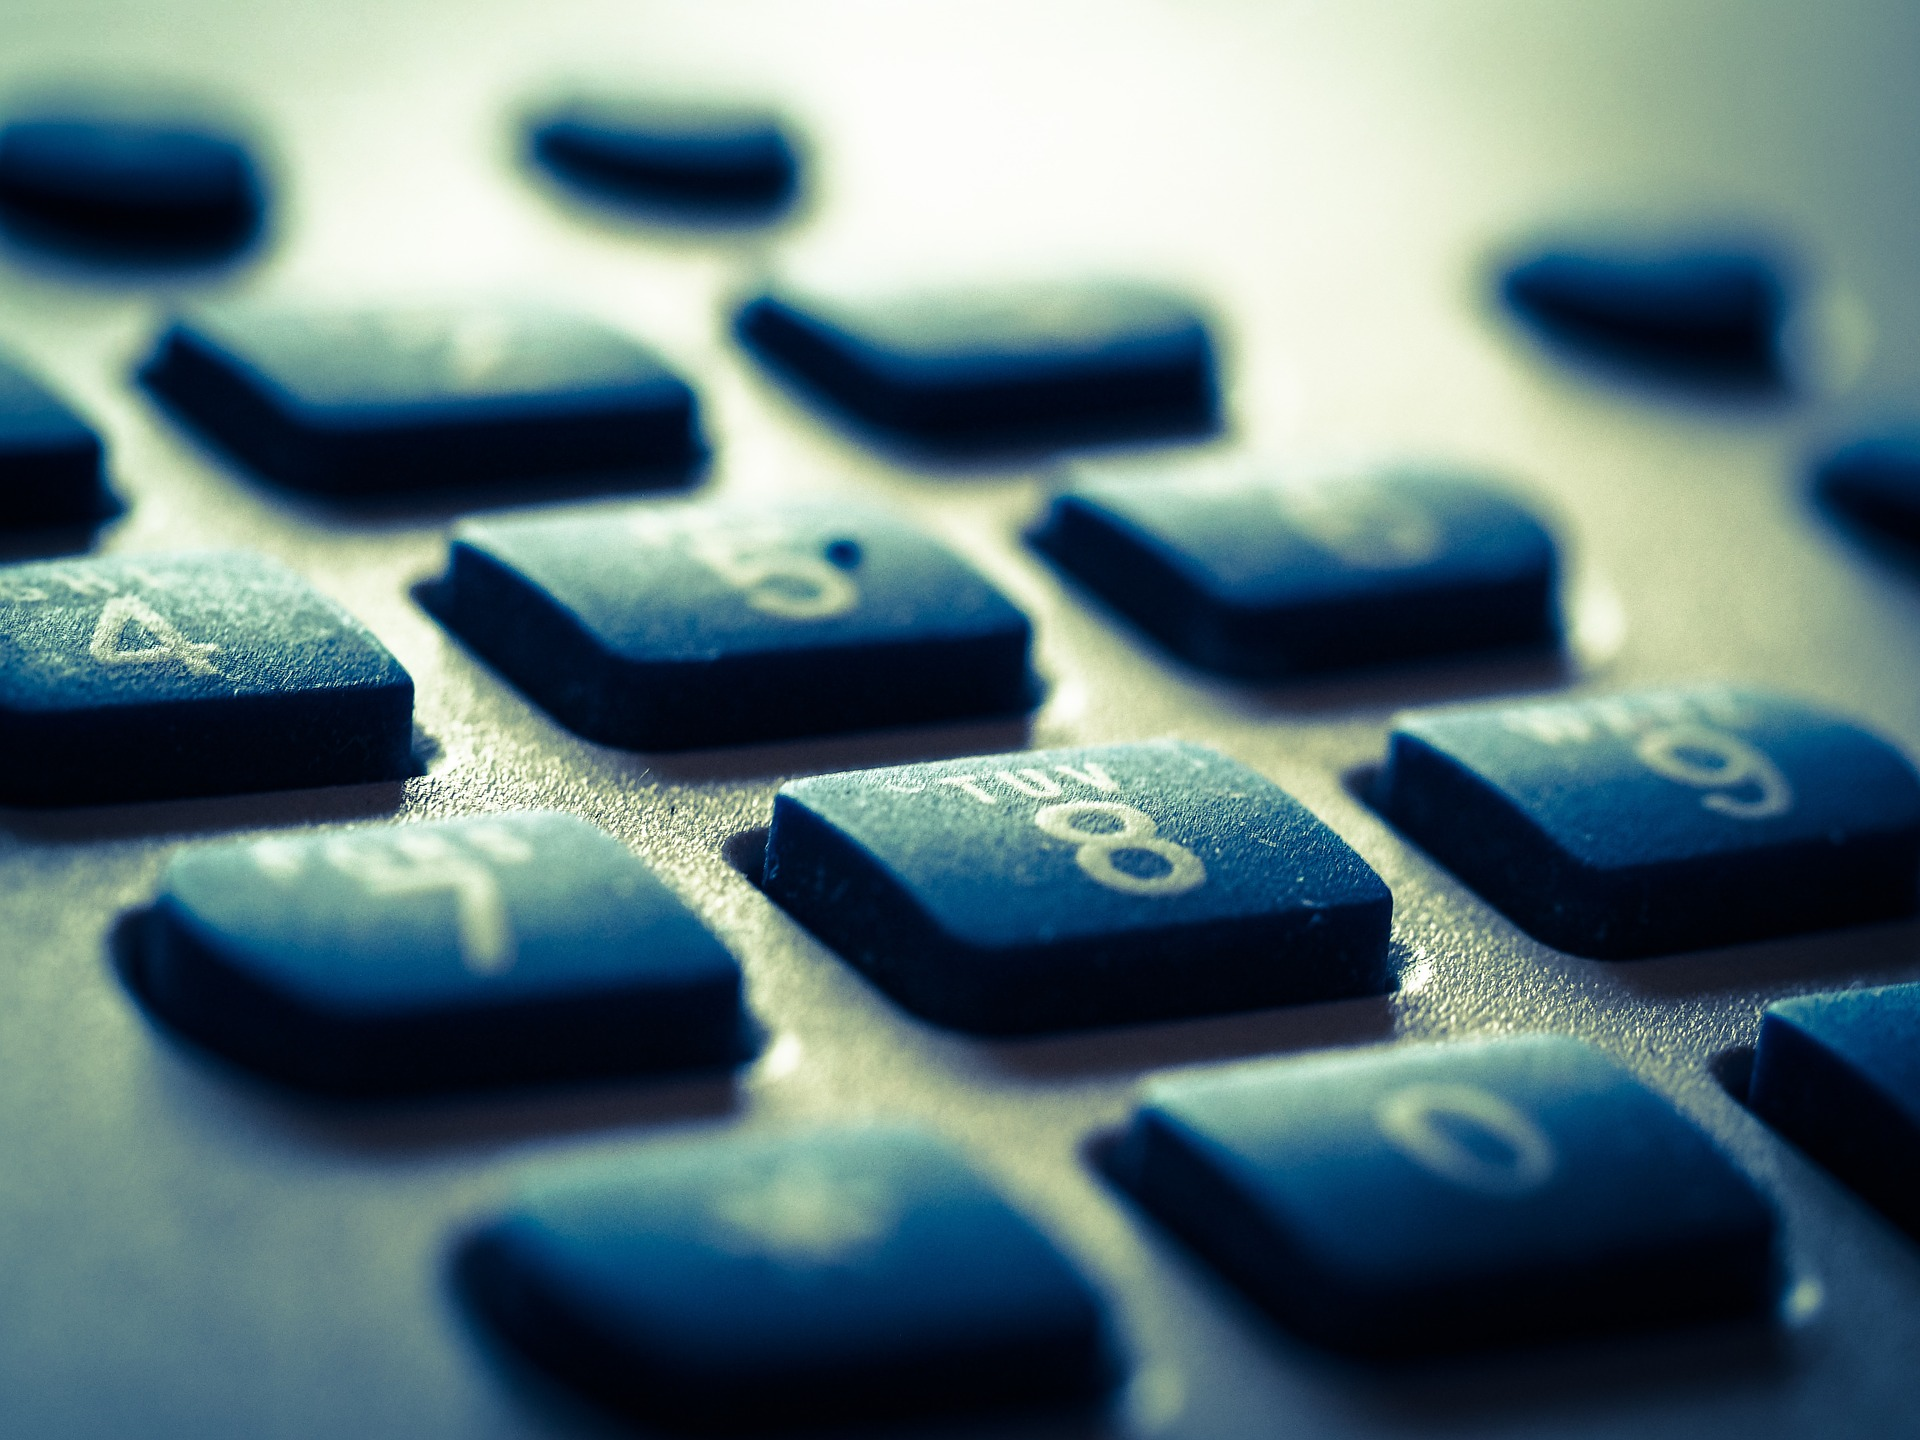 phone-949084_1920